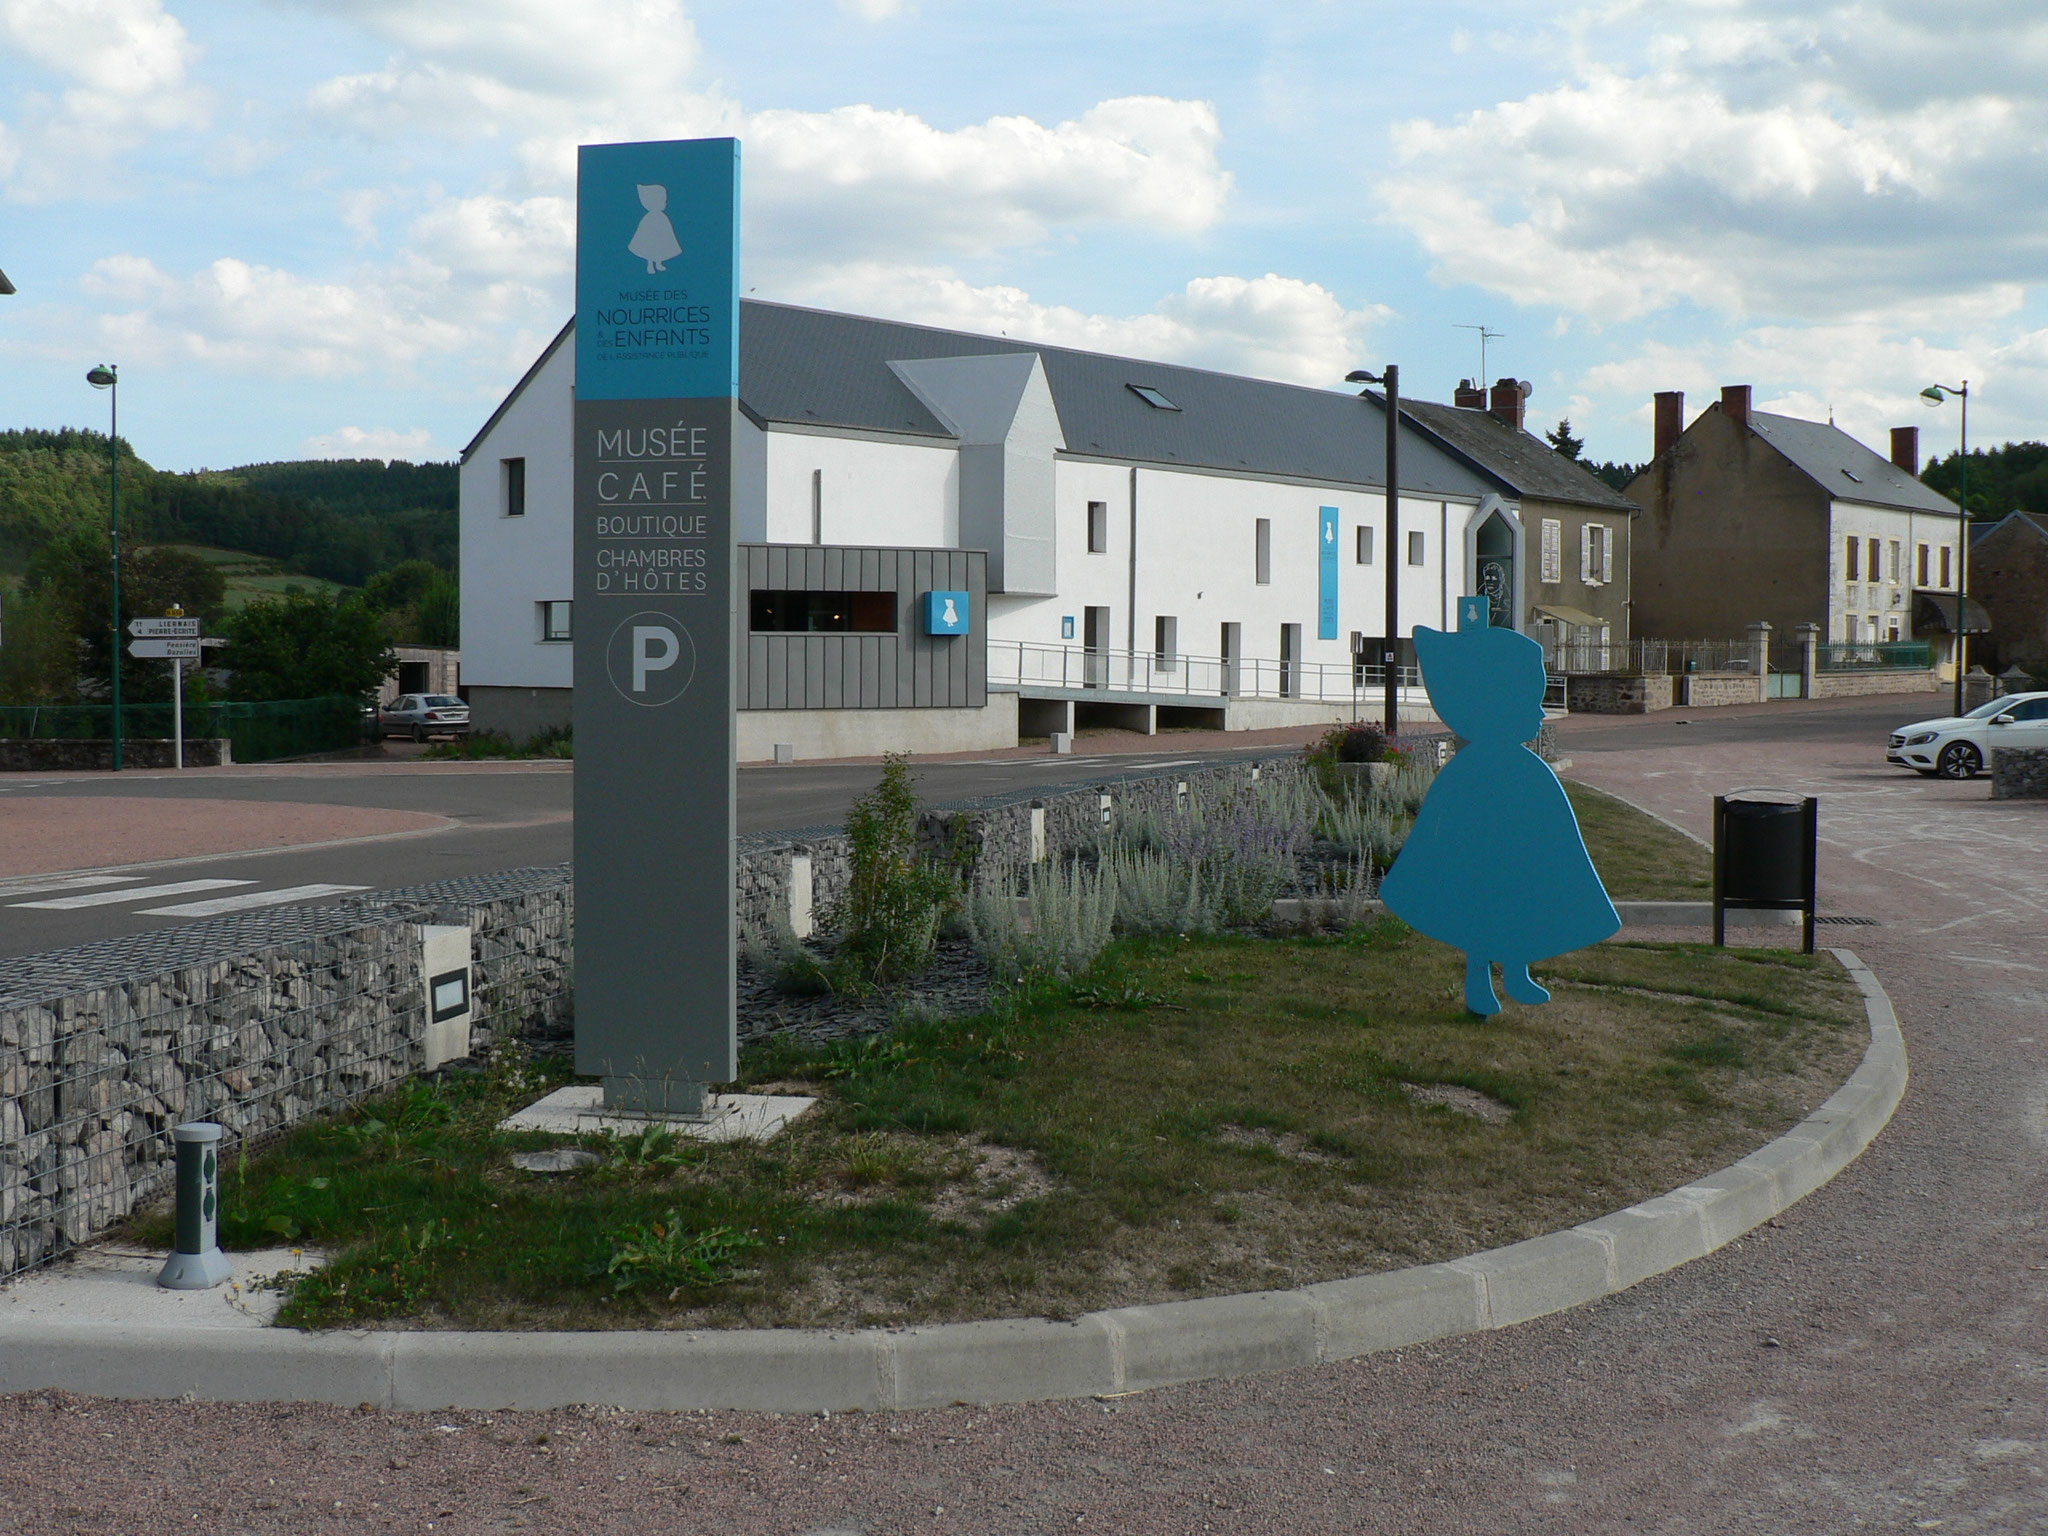 Musée des nourrices_Alligny-en-Morvan